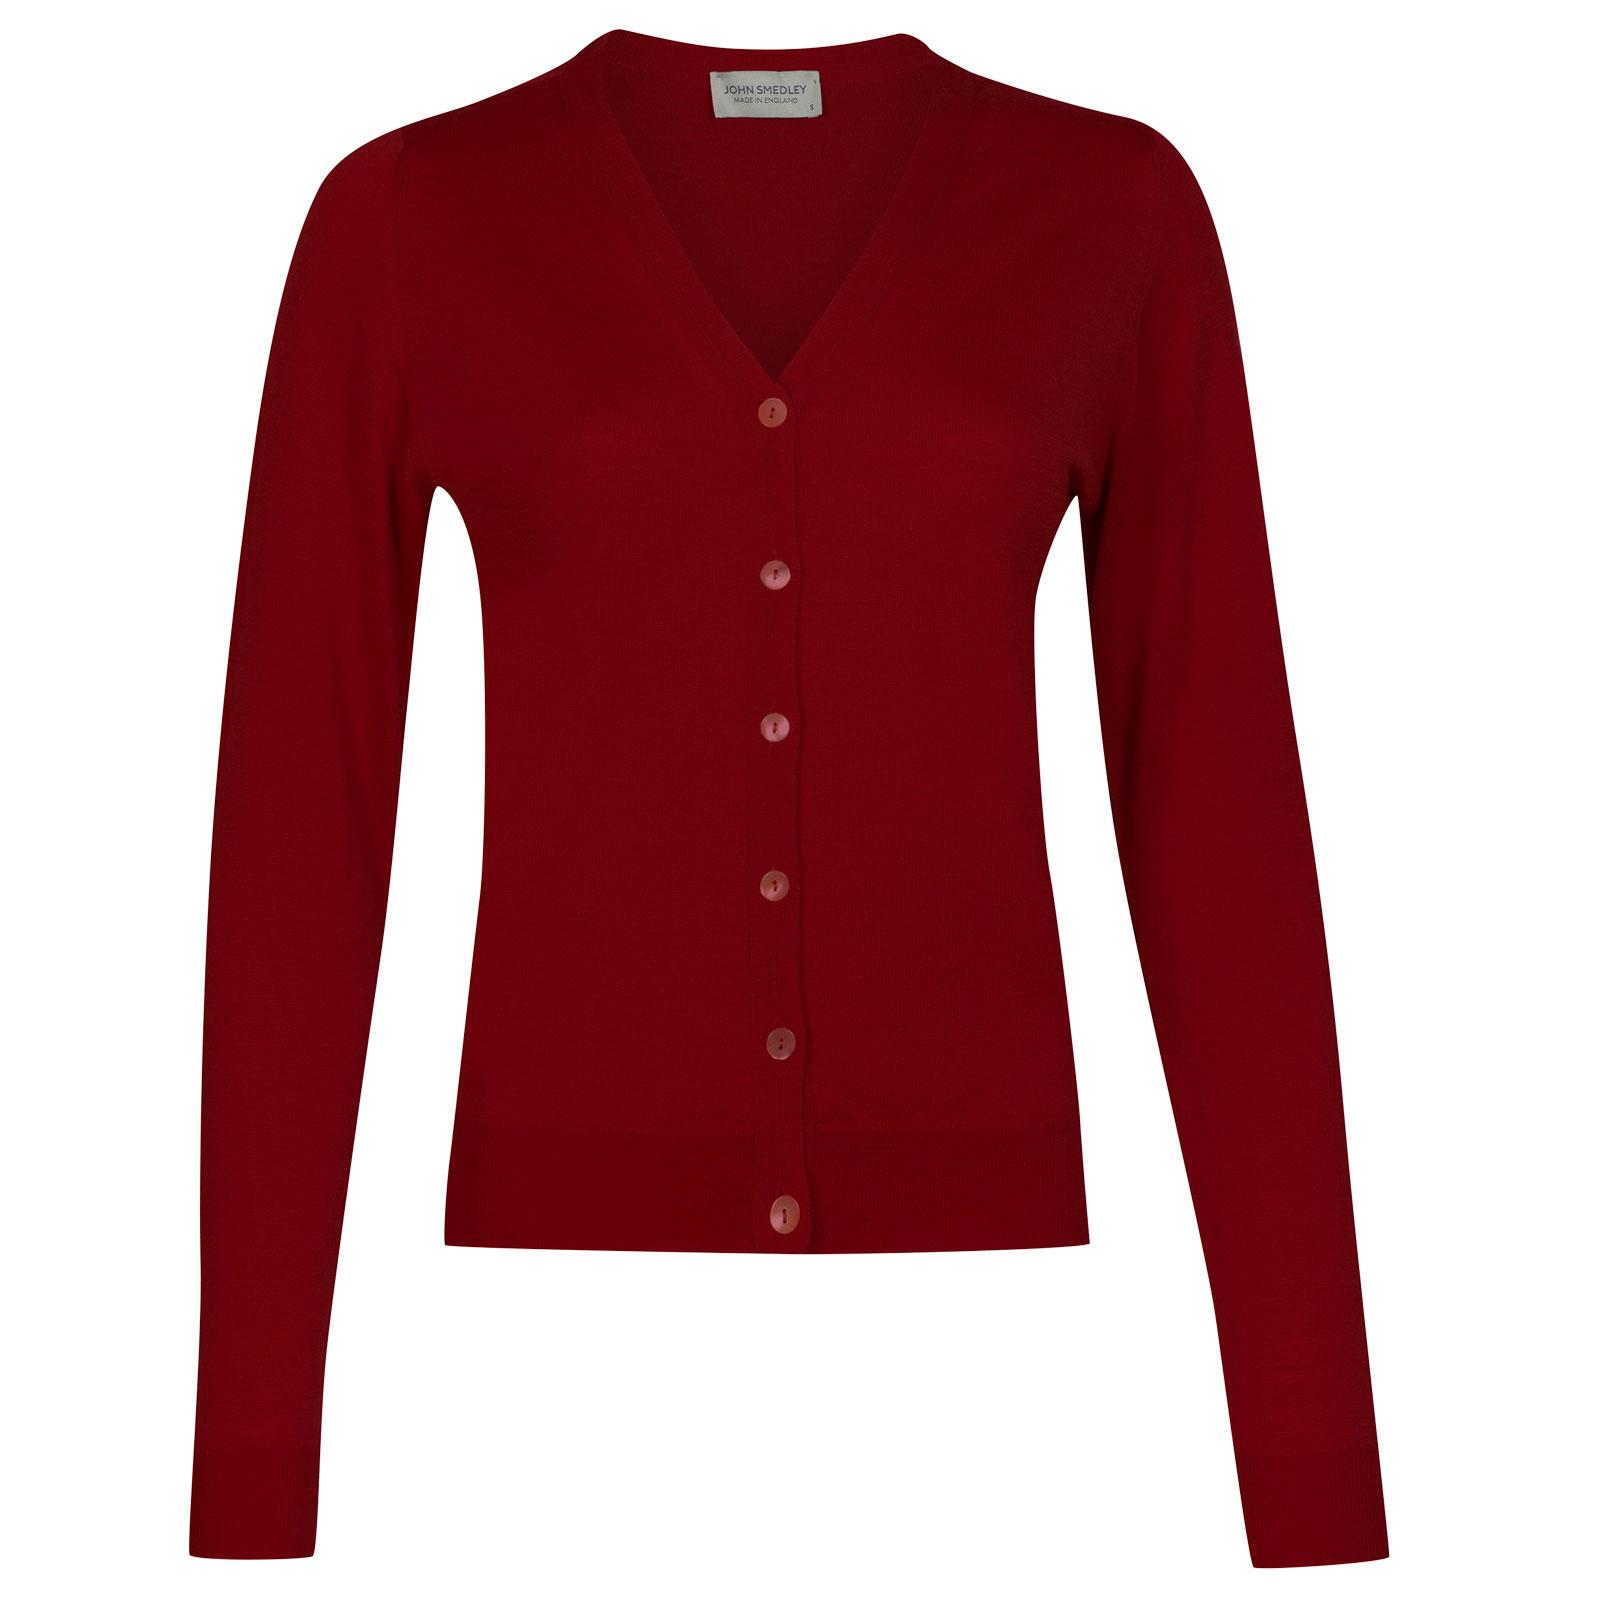 John Smedley rimini Merino Wool Cardigan in Crimson Forest-S